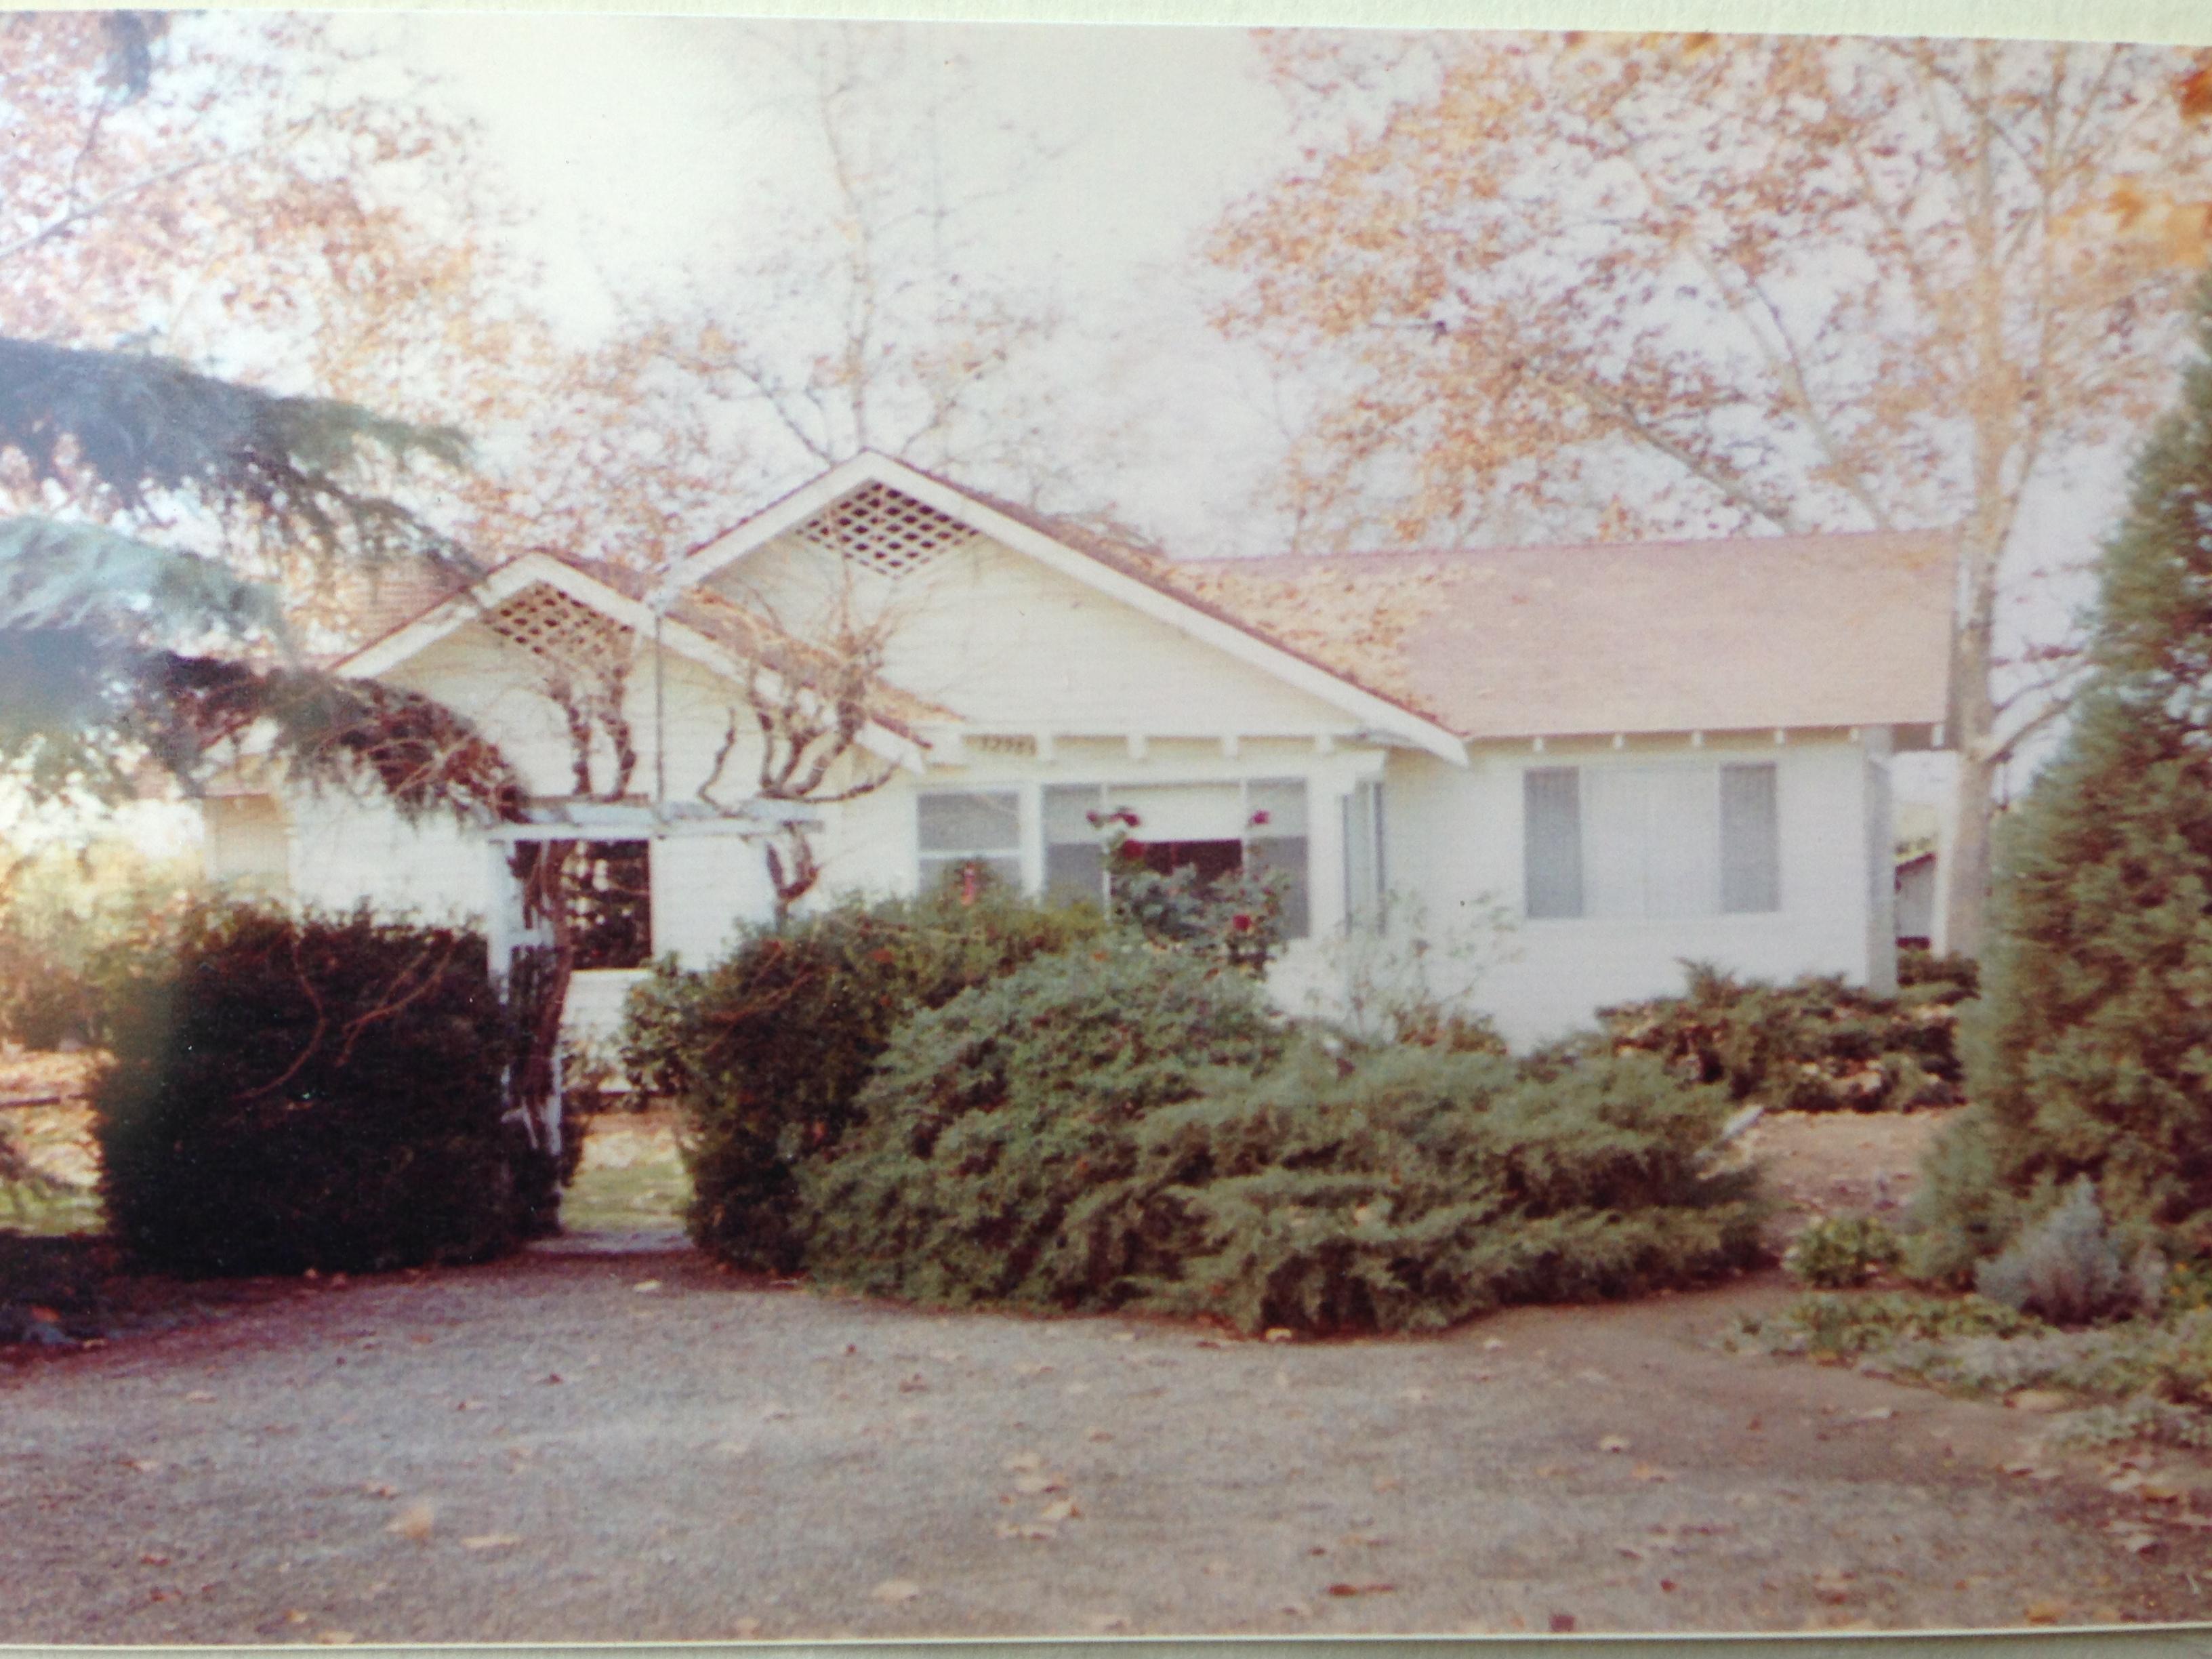 The McKellar Family home